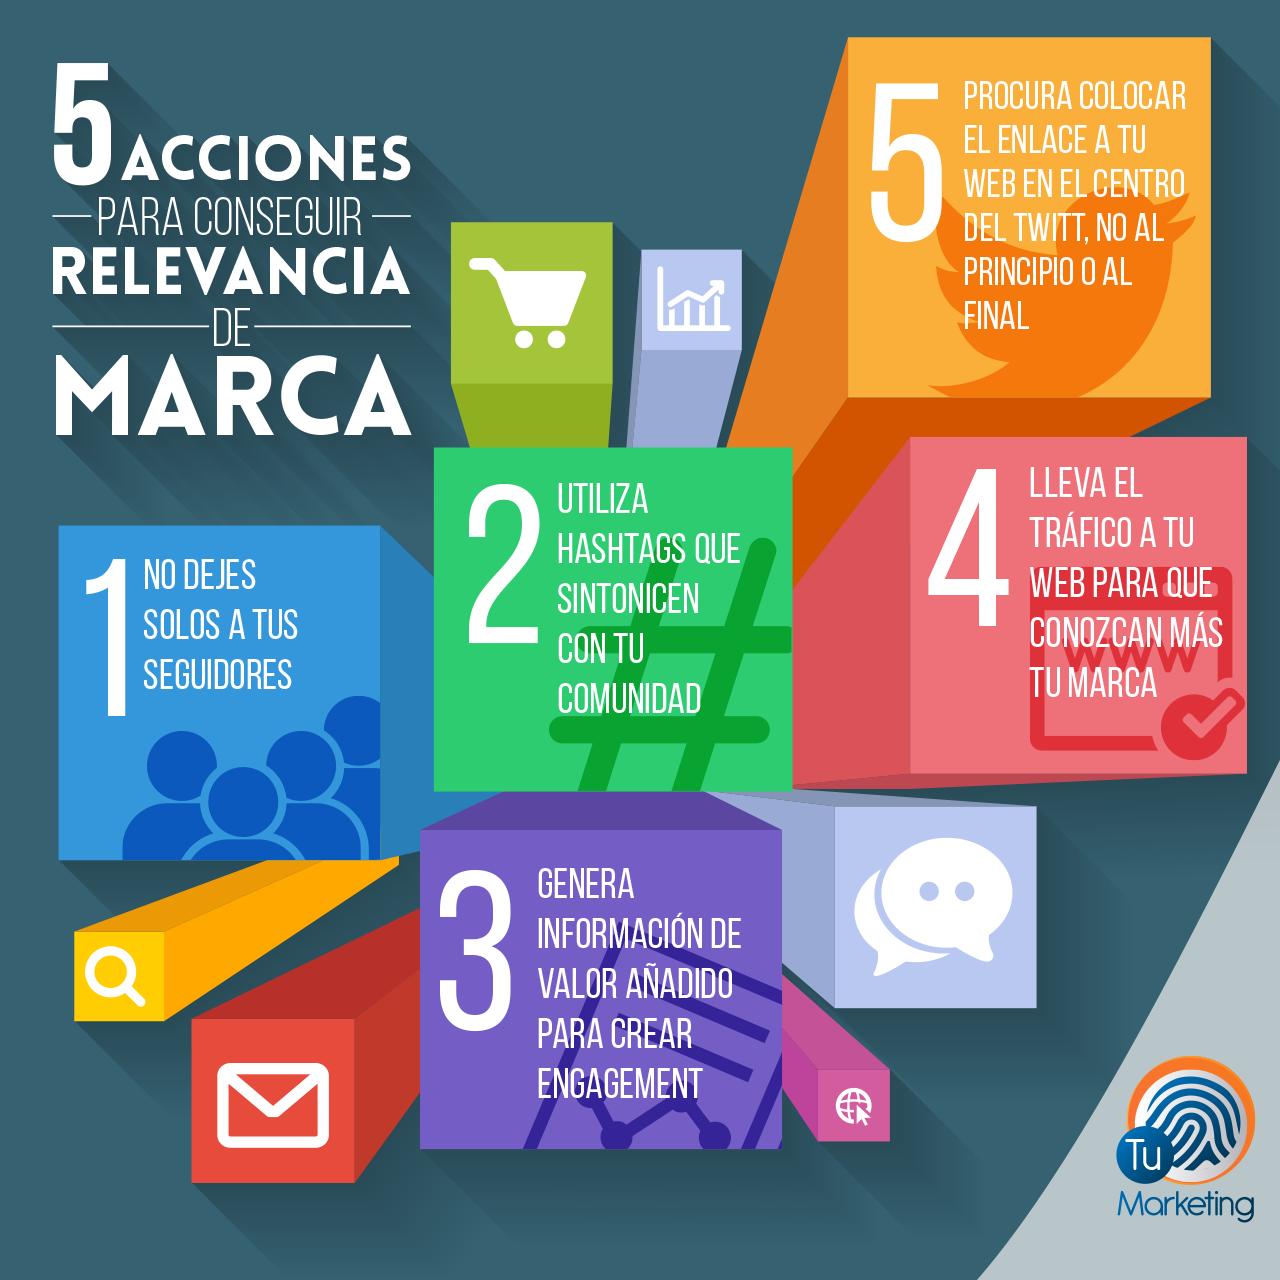 comunidades de marca más importantes de México